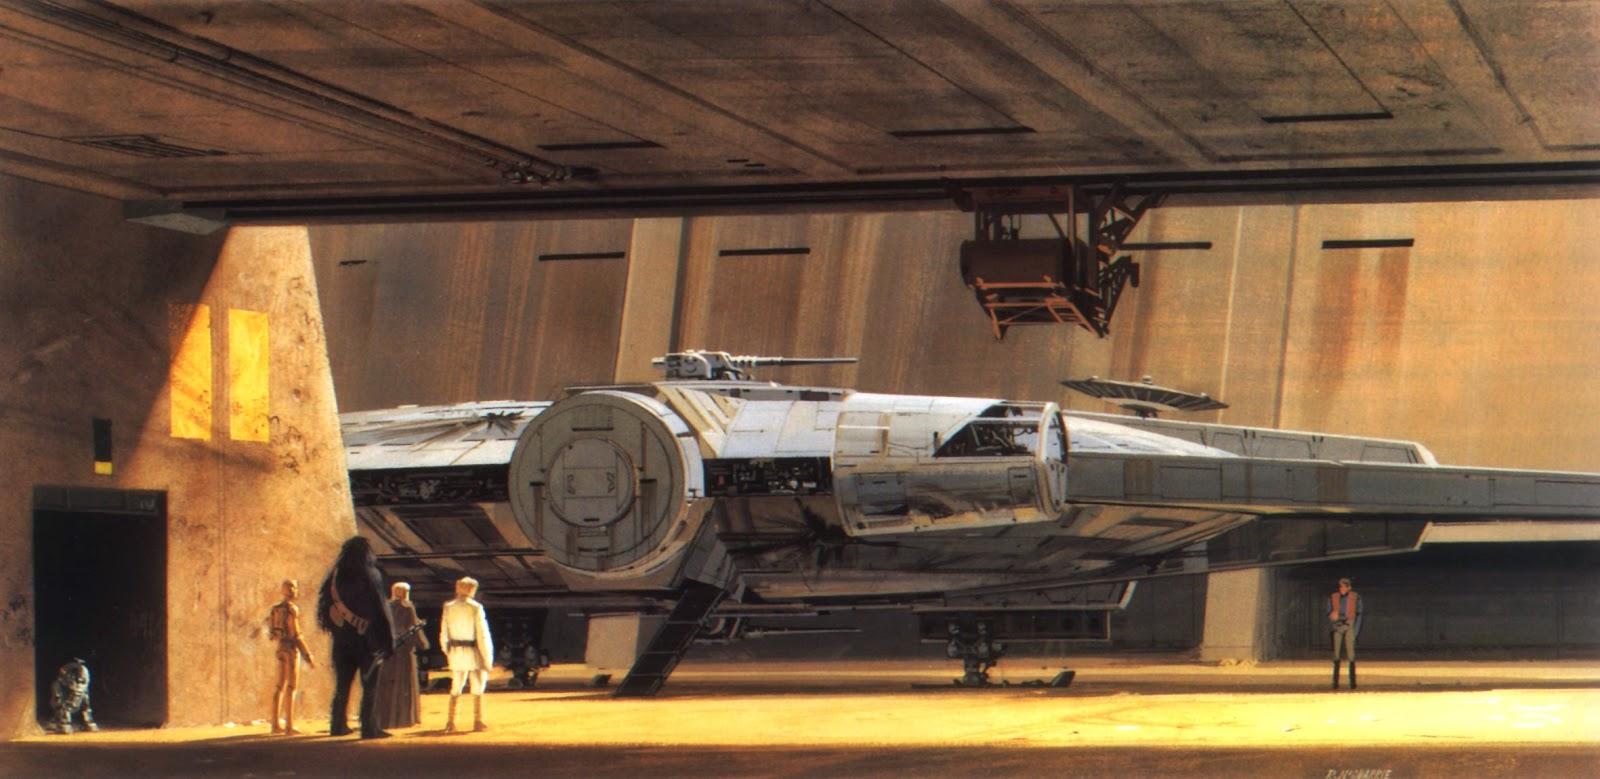 The Millennium Falcon inside a hangar